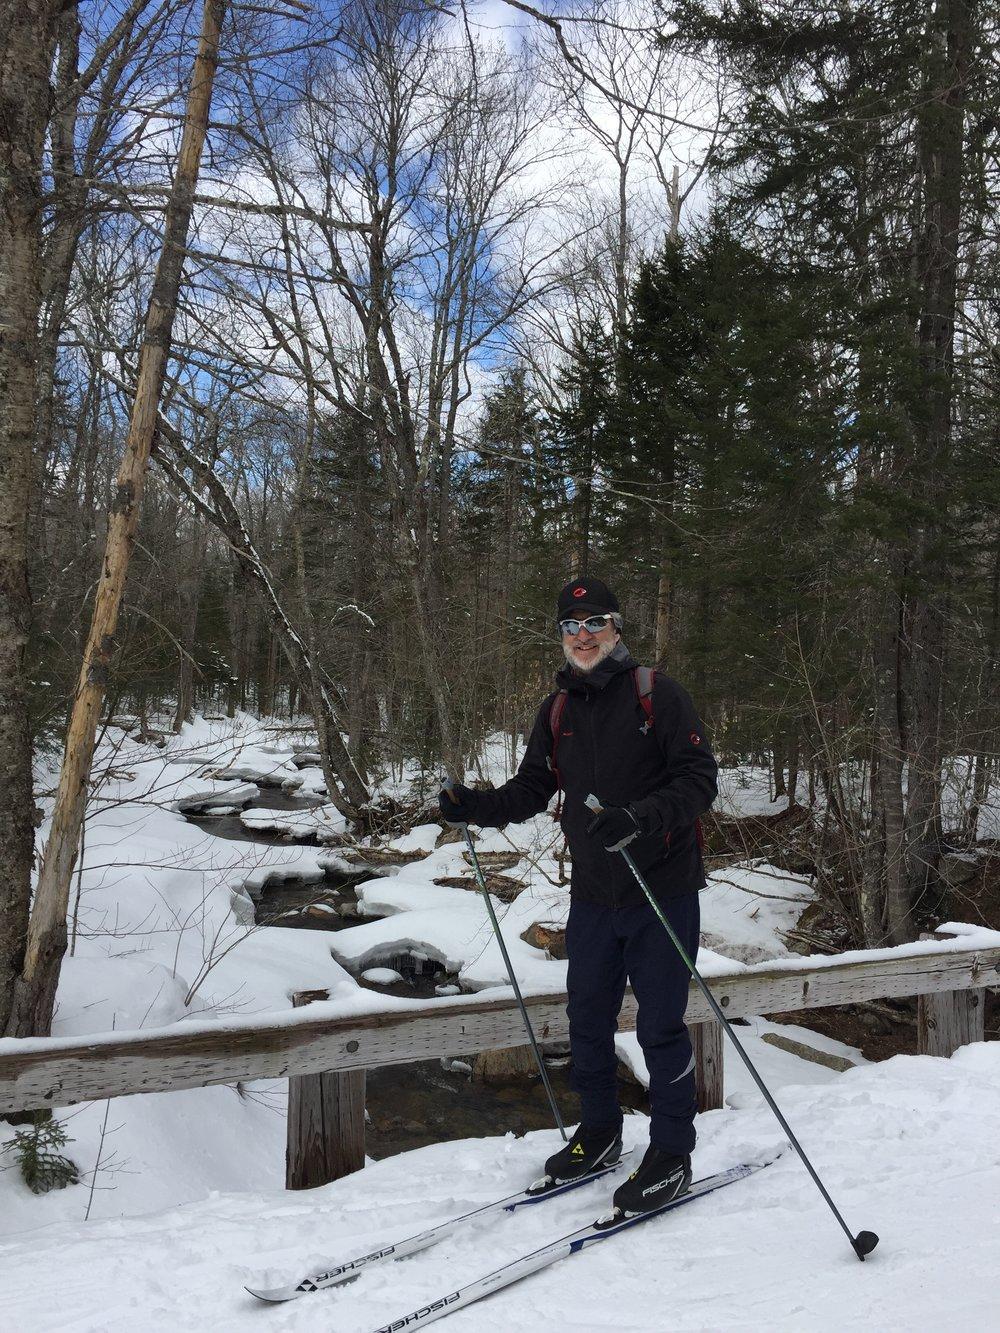 XCSkiResorts.com editor sporting the Fischer Twin Skin skis